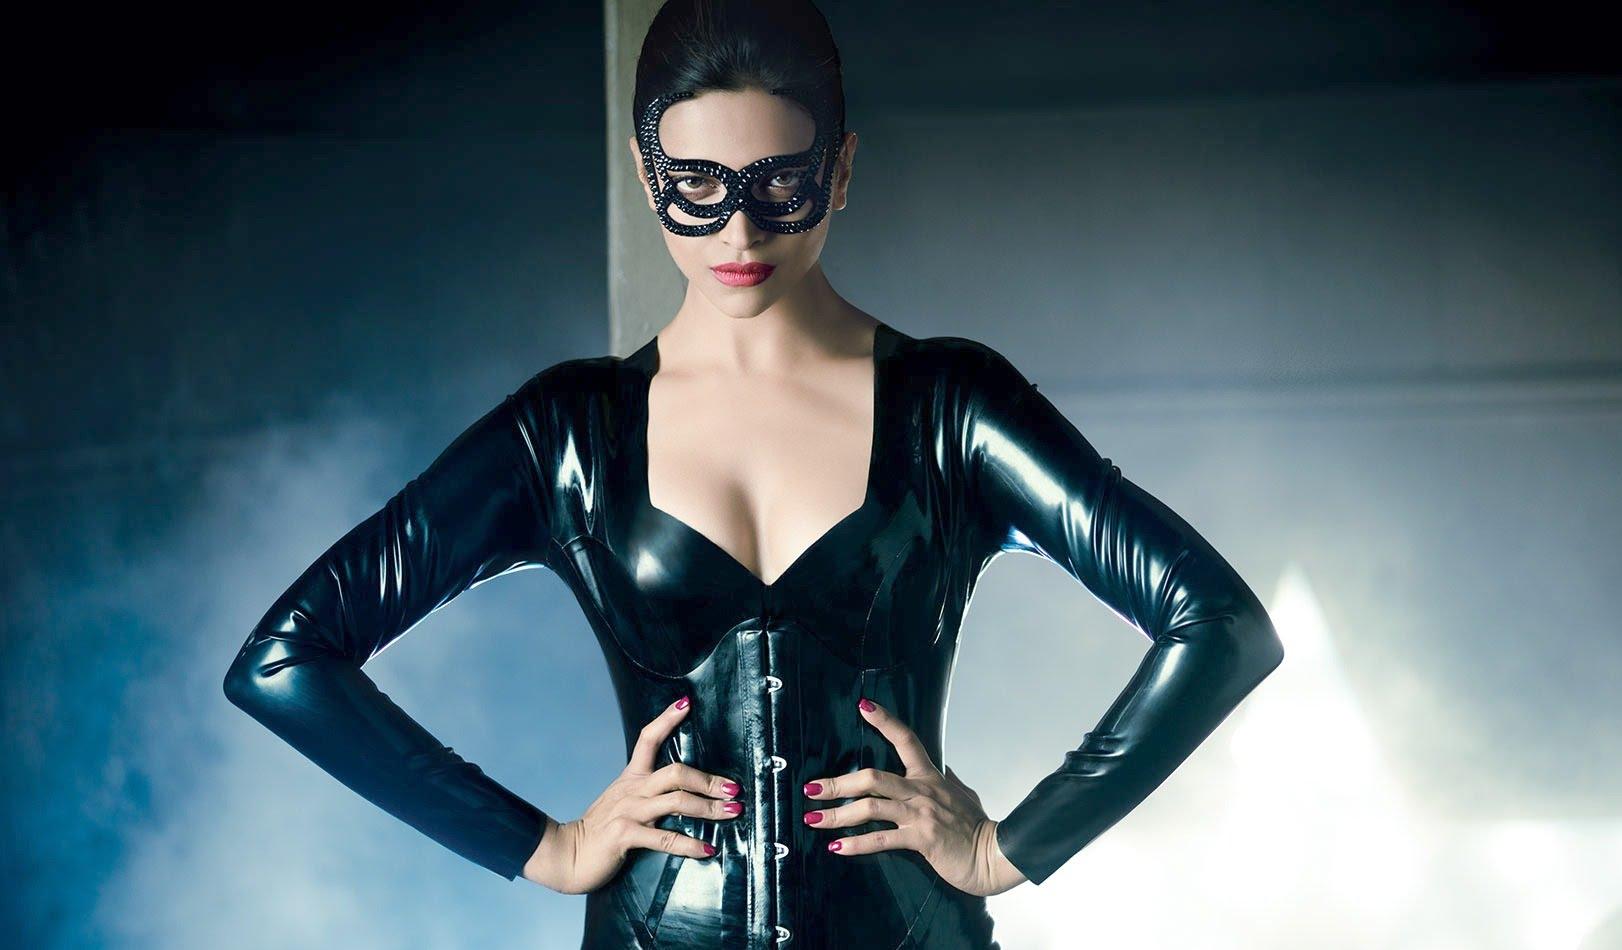 Deepika Padukone casting as serena in 'xXx: The Return of ...